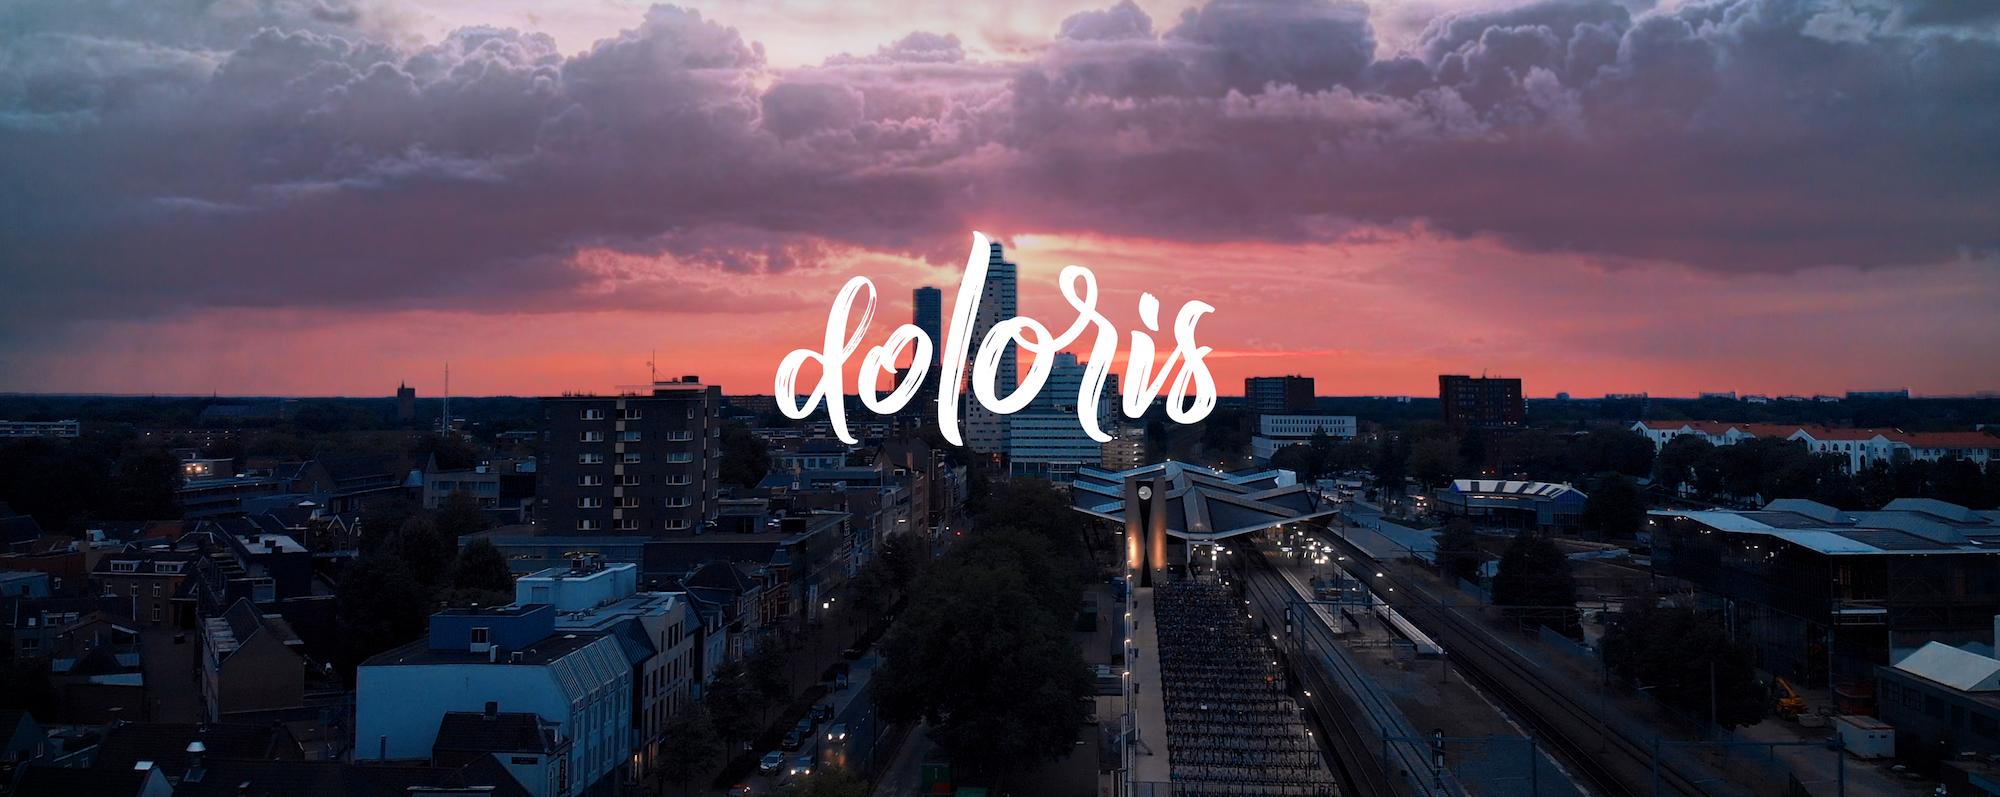 Doloris Tilburg logo